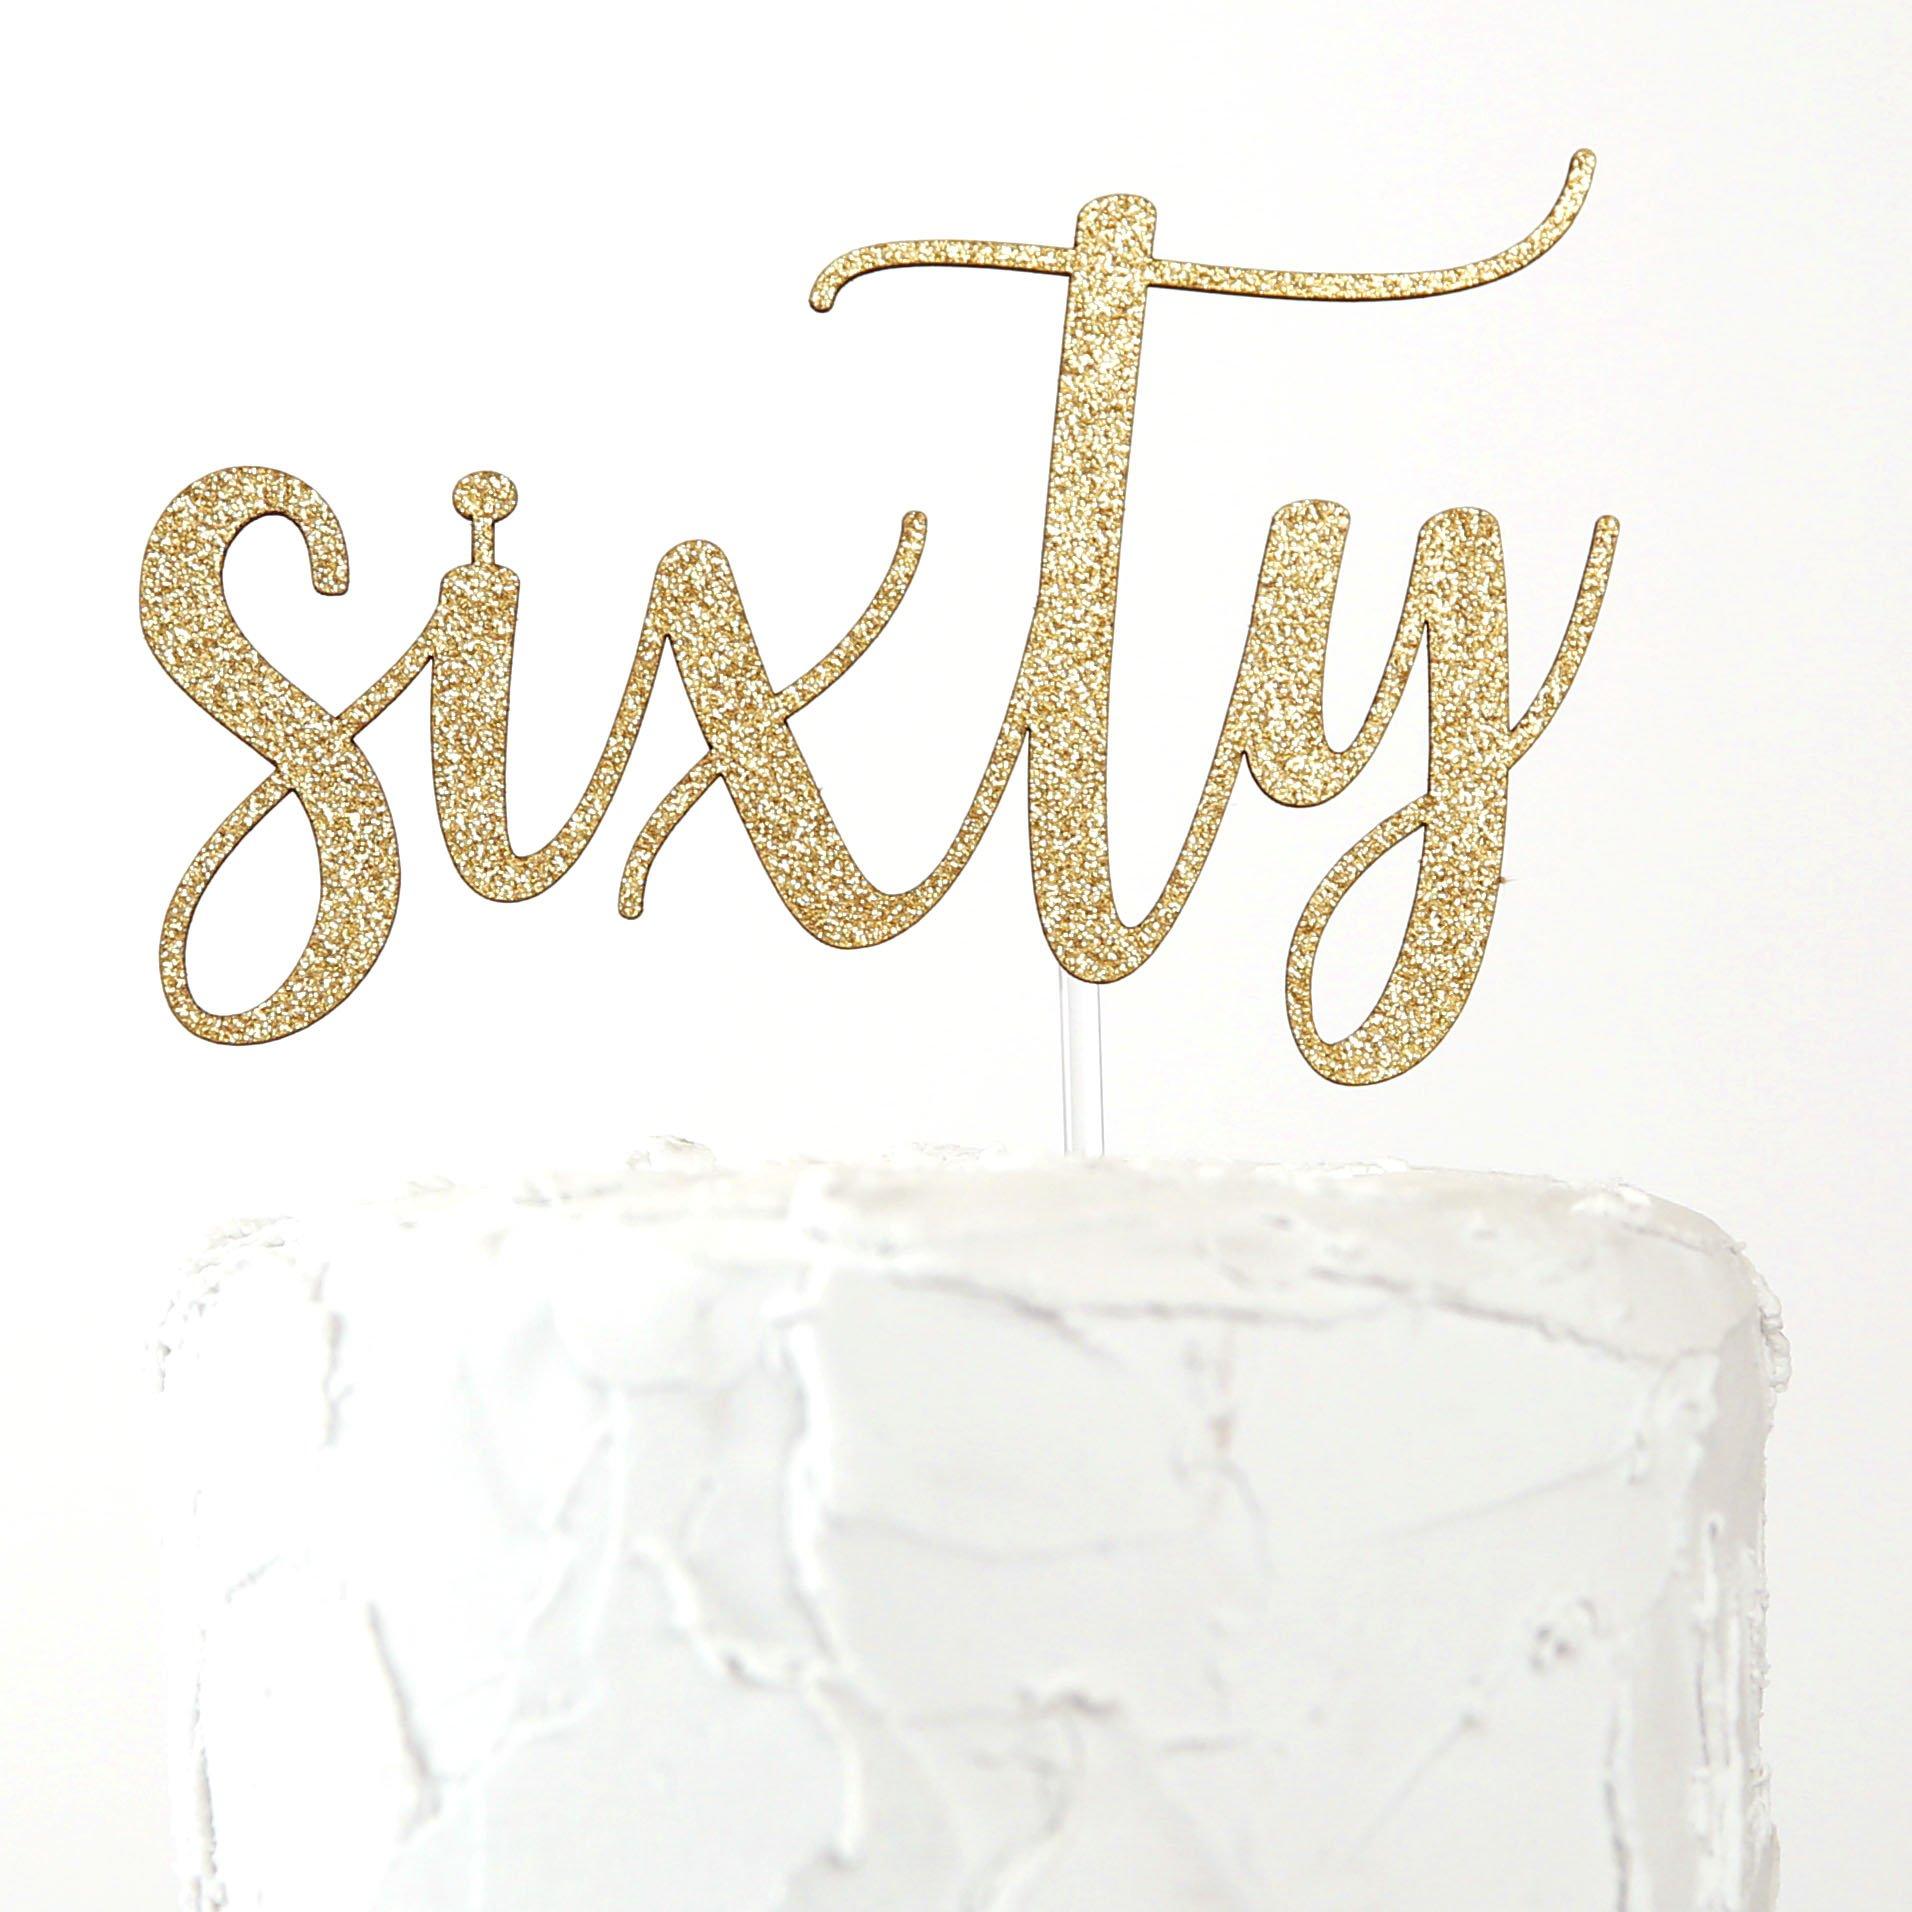 NANASUKO 60th Birthday Cake Topper - sixty - Premium quality Made in USA